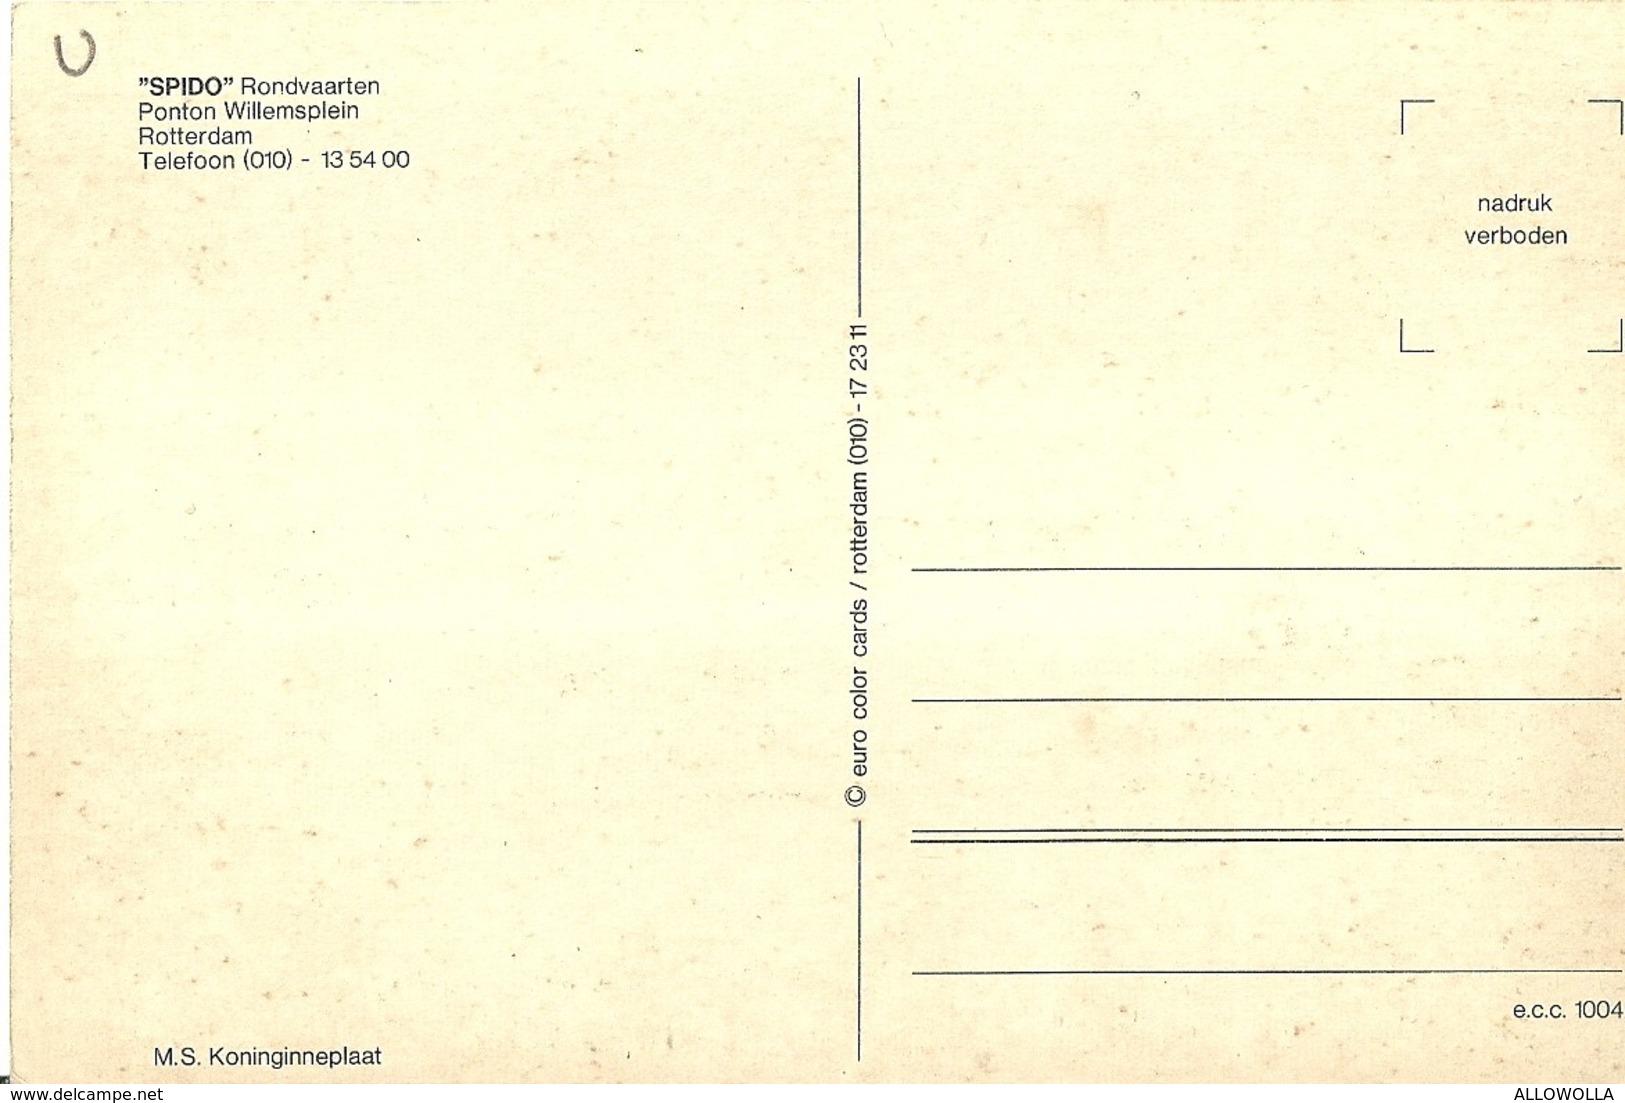 "3436 ""SPIDO-RONDVAARTEN-PONTON WILLEMSPLEIN-ROTTERDAM-M.S. KONINGINNEPLAAT""ANIMATA- CART. ILL.POST. ORIG. NON SPED. - Barche"